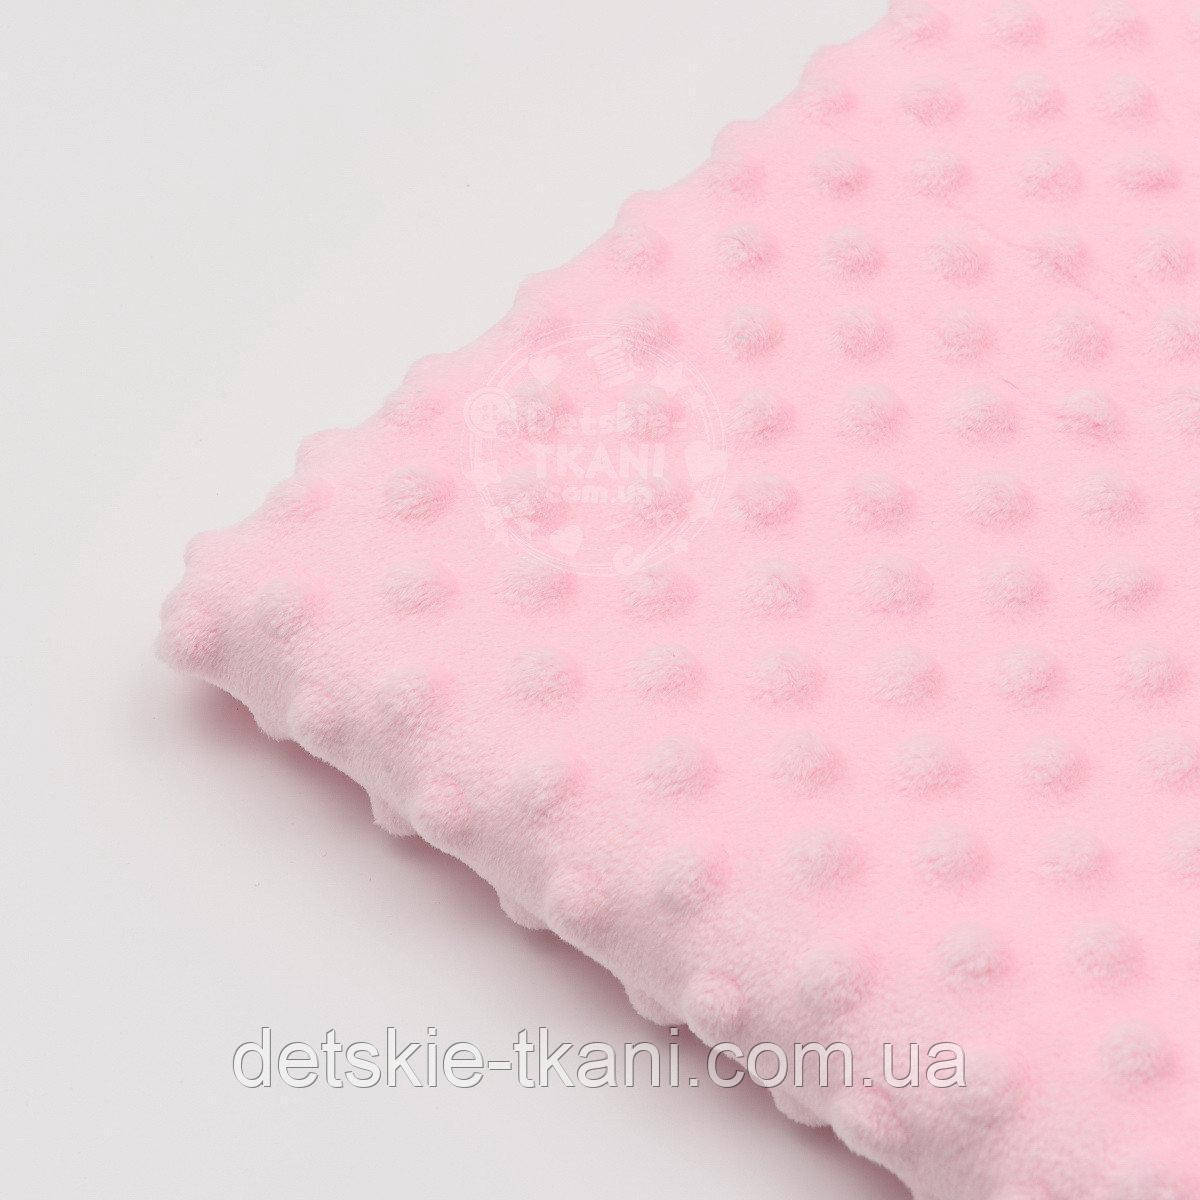 Два лоскута плюша minky М-6 светло-розового, размер 20*75, 25*60 см